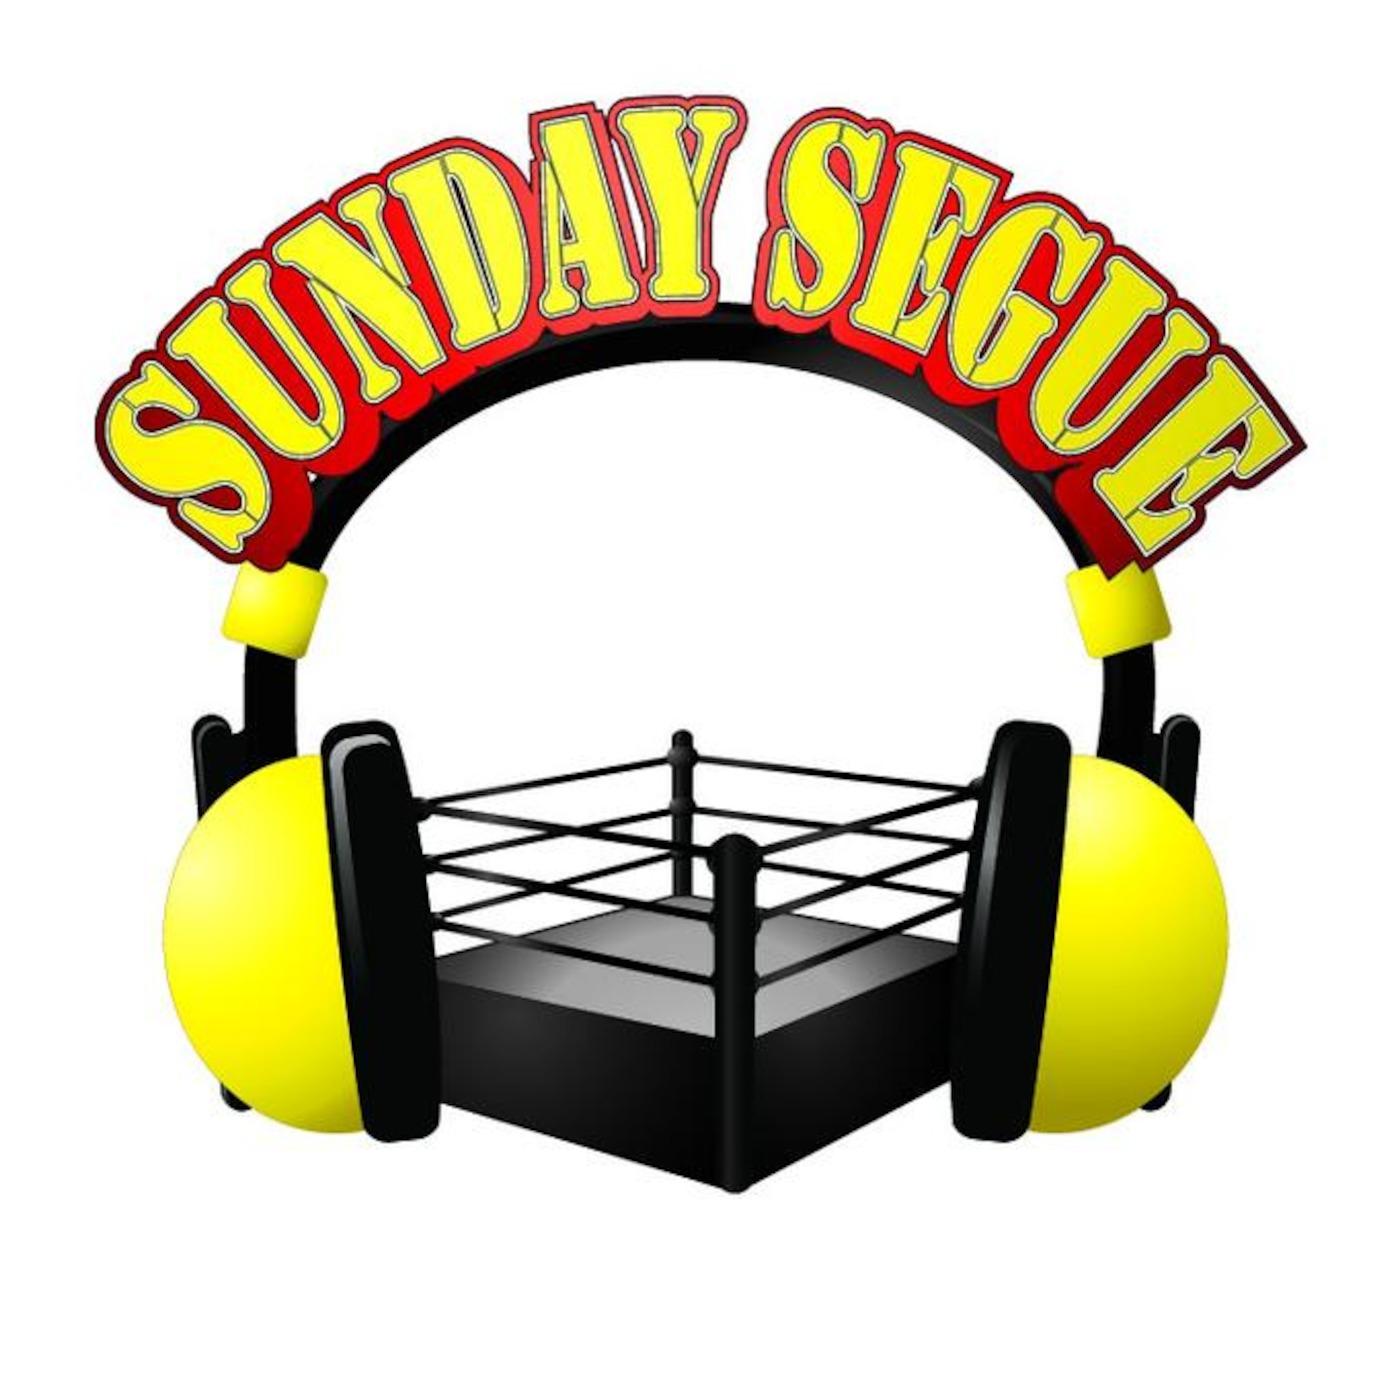 Sunday Segue Wrestling Podcast